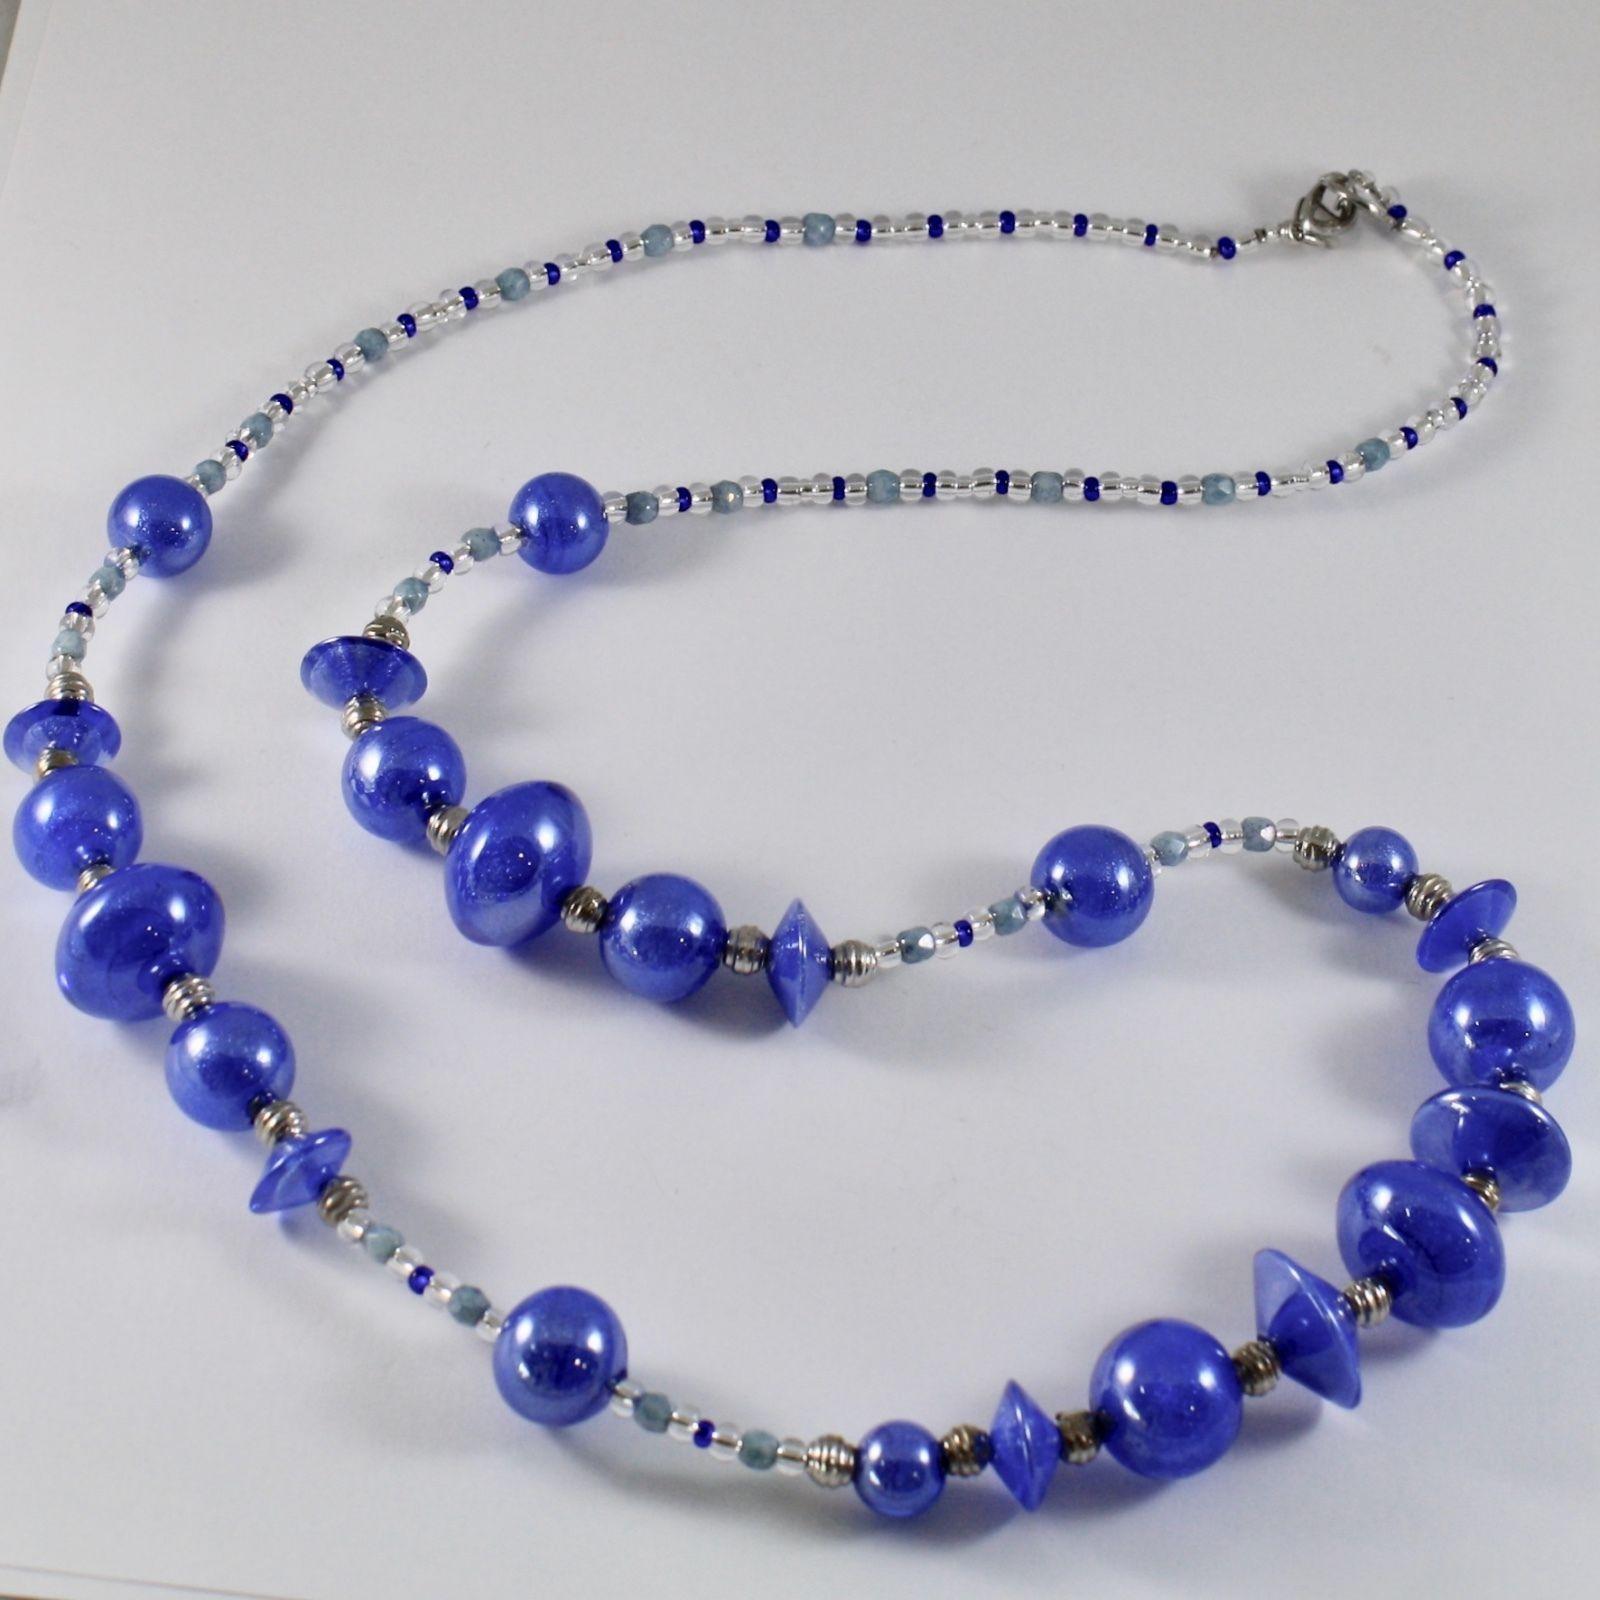 ANTICA MURRINA VENEZIA NECKLACE BLUE MURANO GLASS DISCS BALLS, 31 INCHES LONG